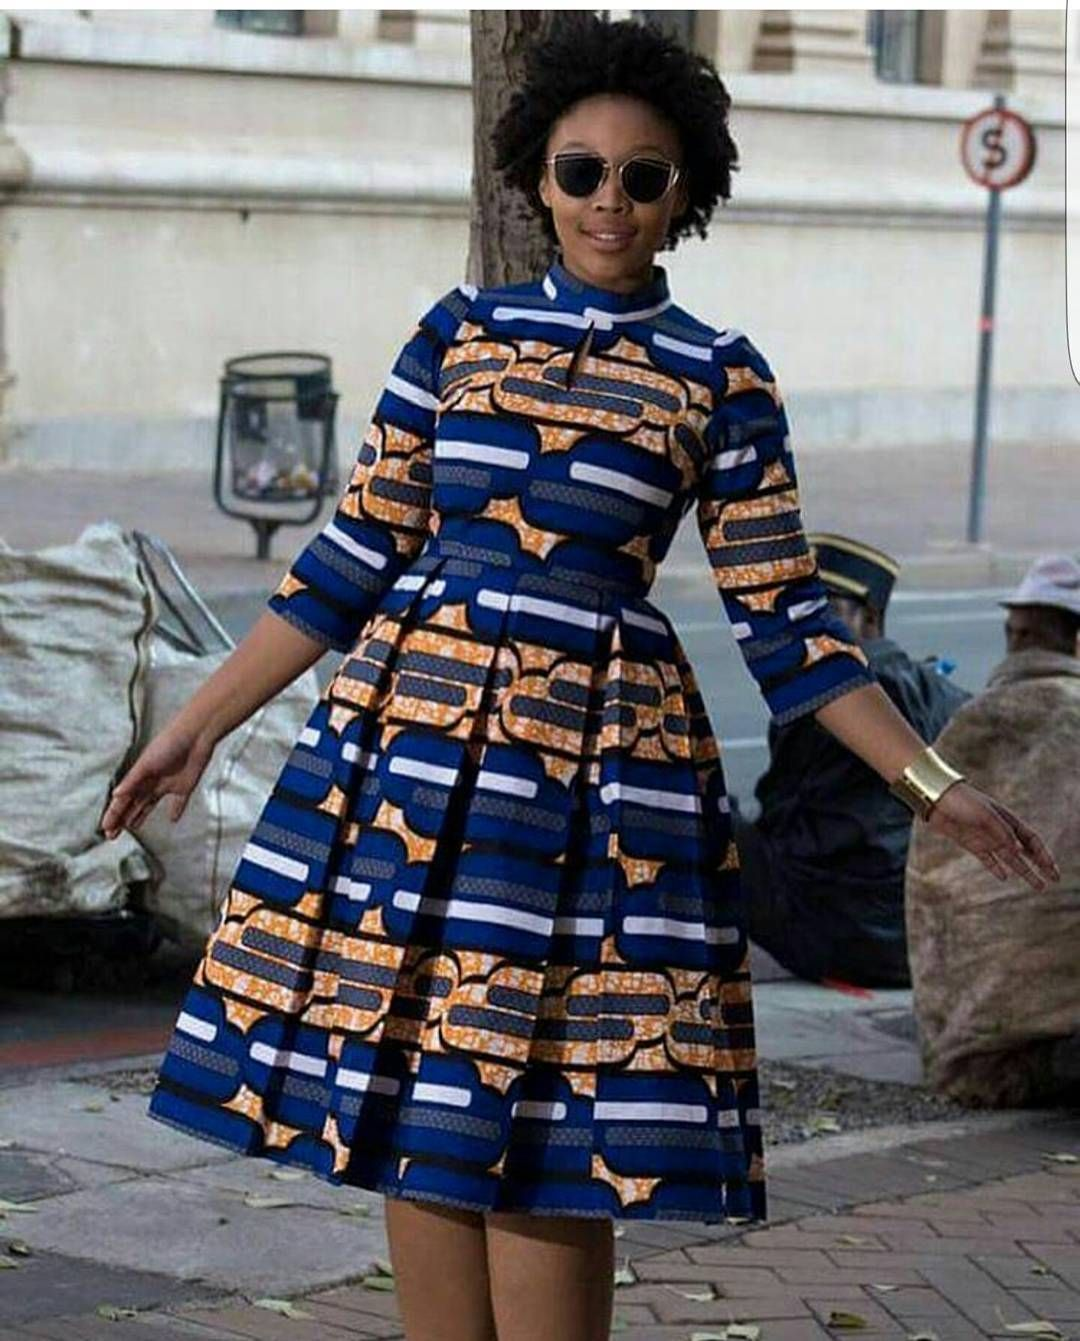 "AnkaraCatalogue on Instagram: ""Comfy and decent!!! #ankaracatalogue #africanfabrics #buynigeria #buyafrican #africanprint #ankaraswag"""